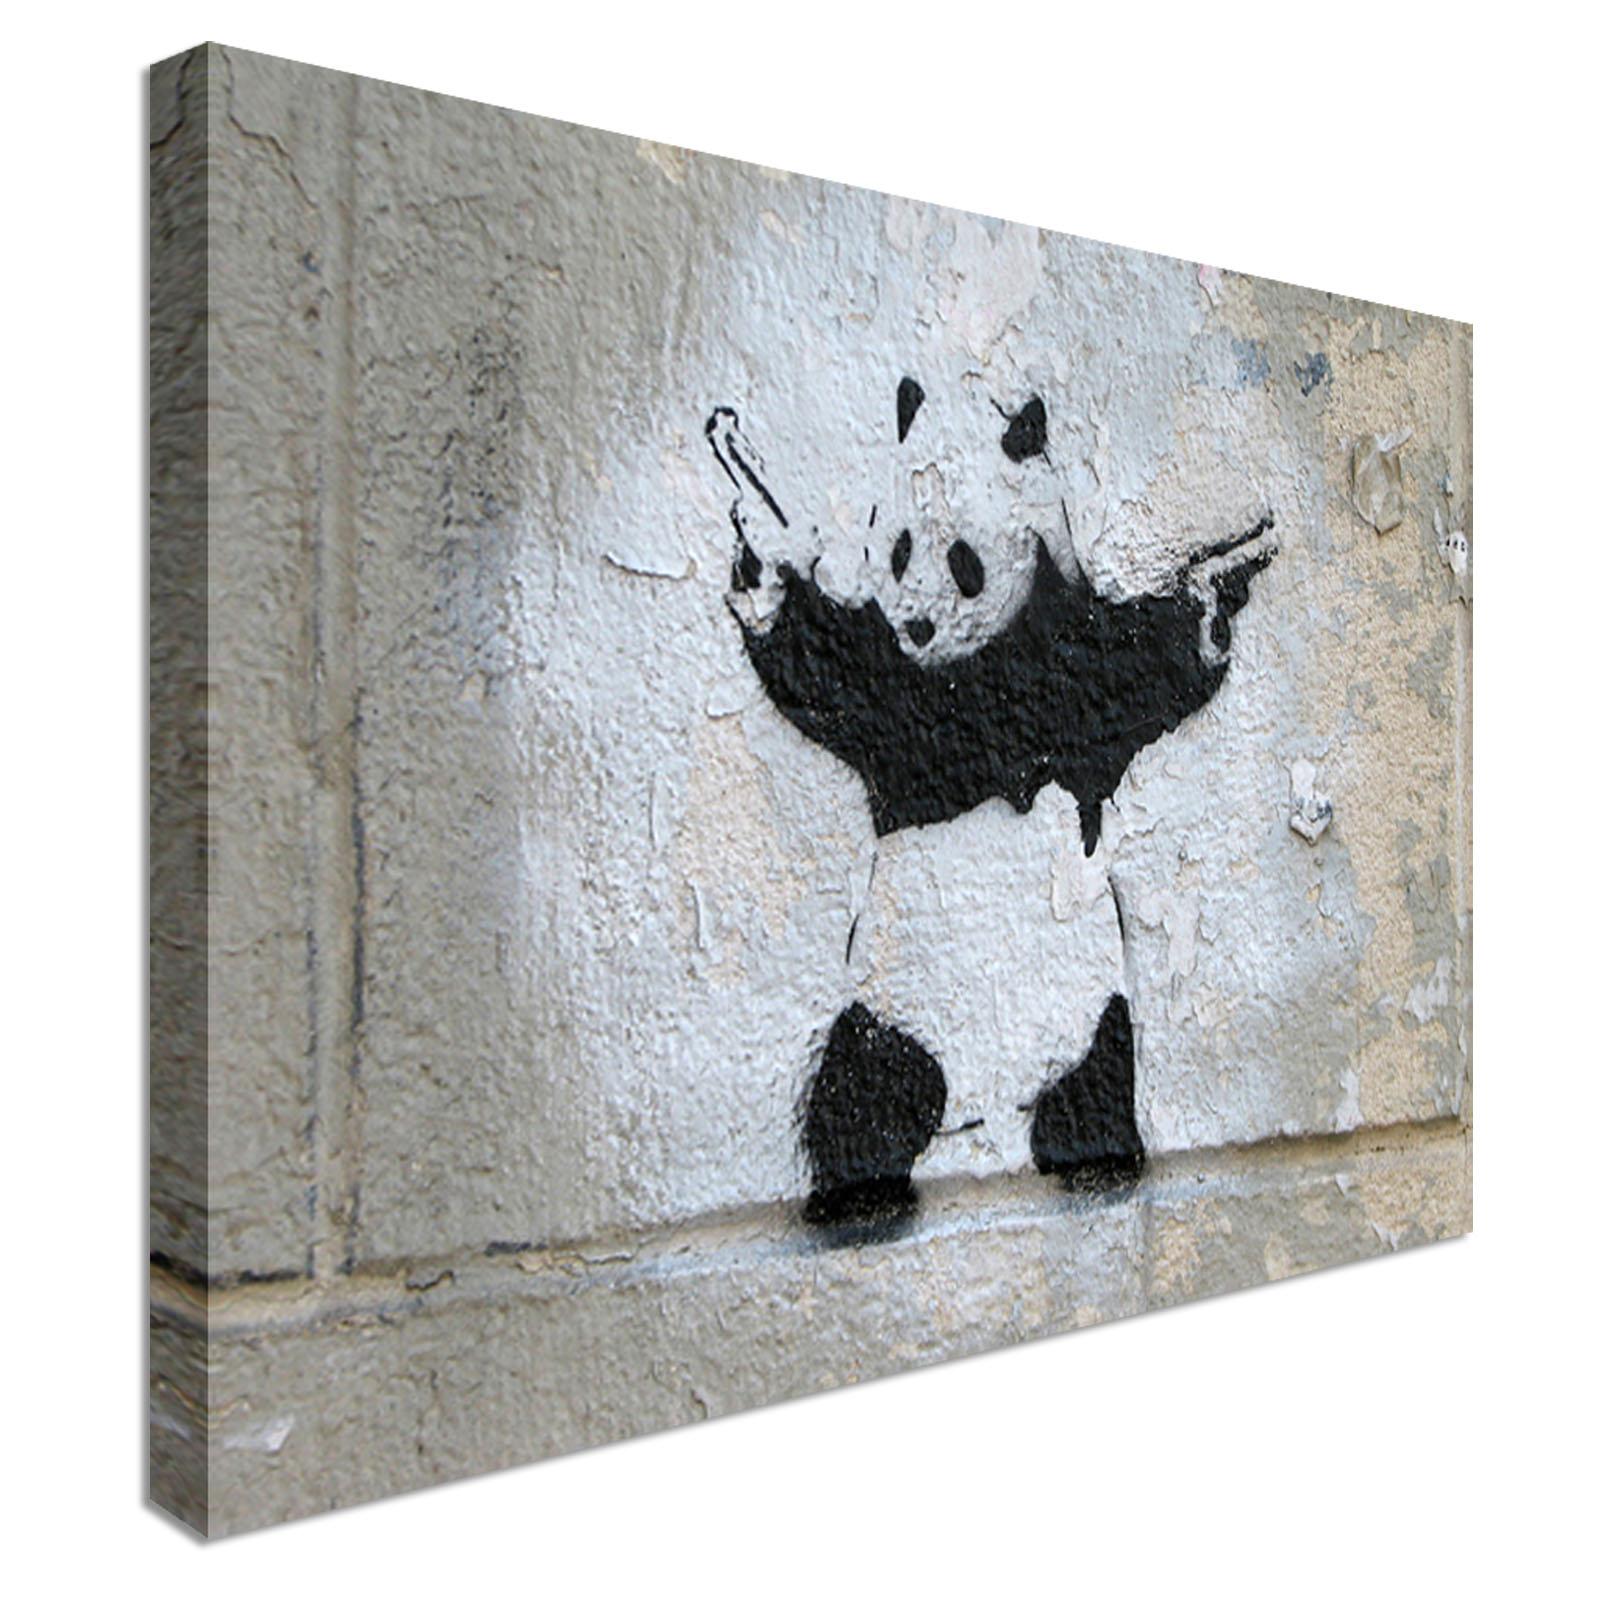 Panda With Guns 20x30 Mirrored77.jpg